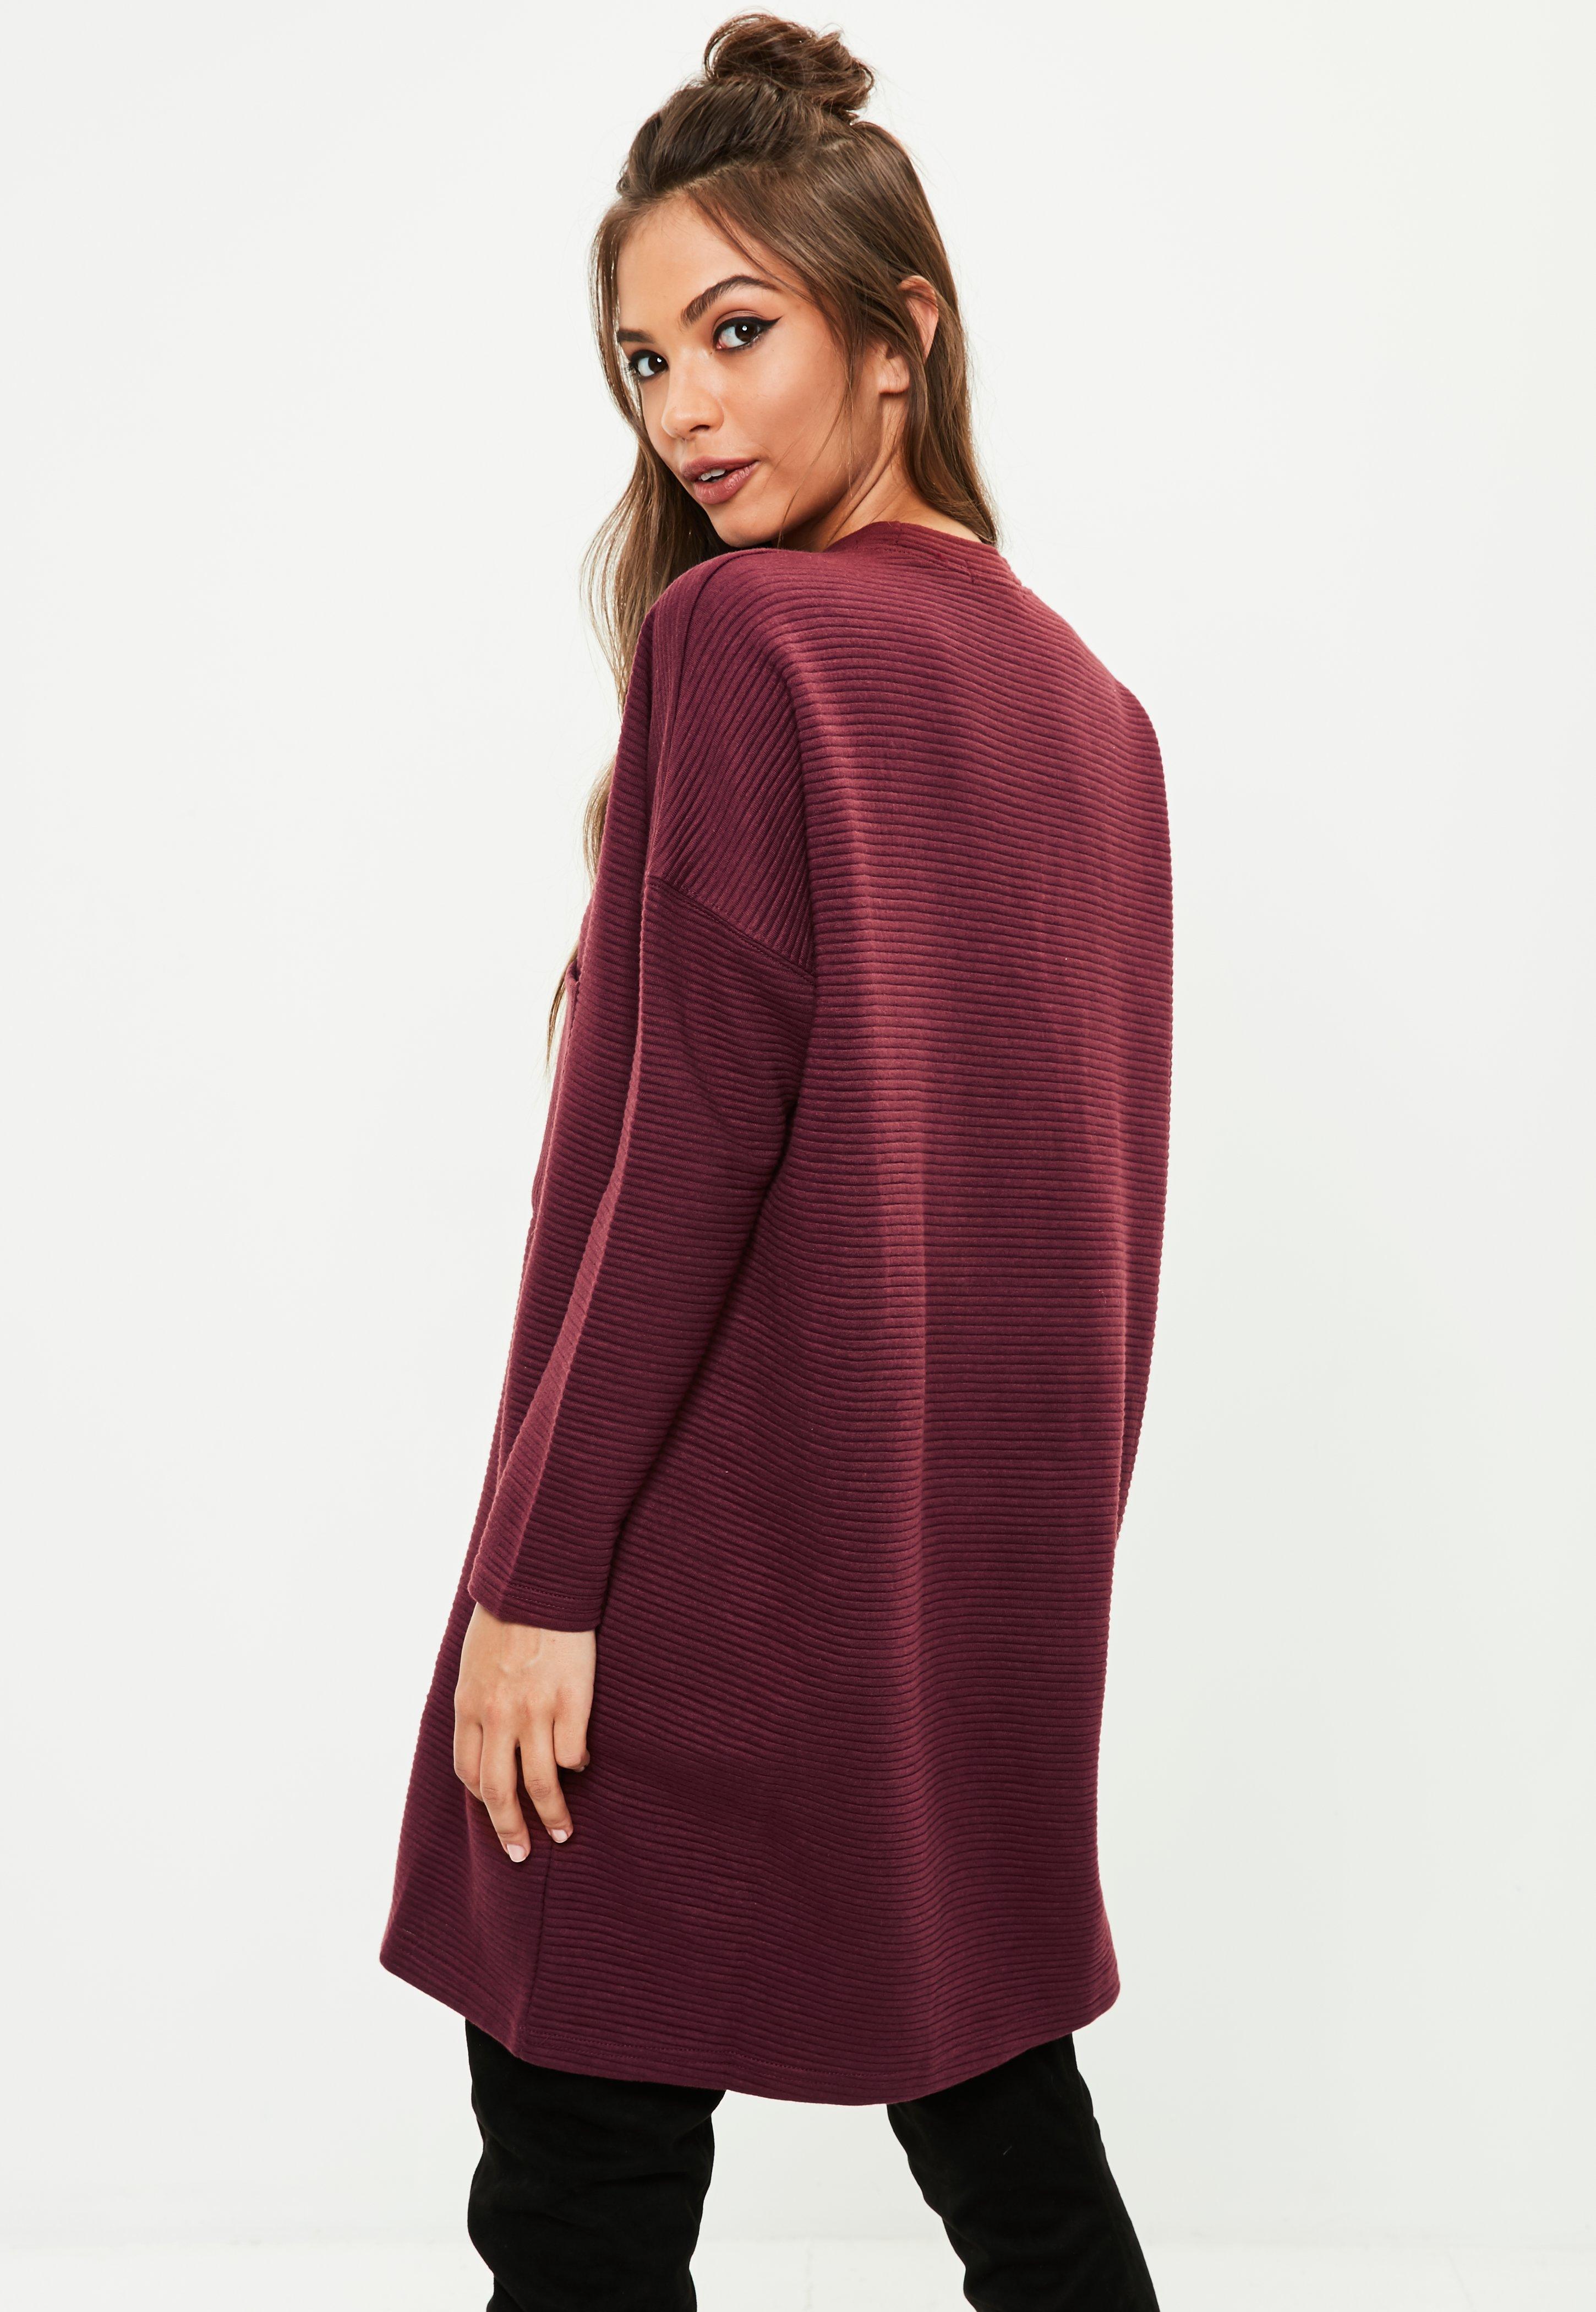 Burgundy Pocket Dress Ribbed Lyst Missguided Sweater VqUMSzpG